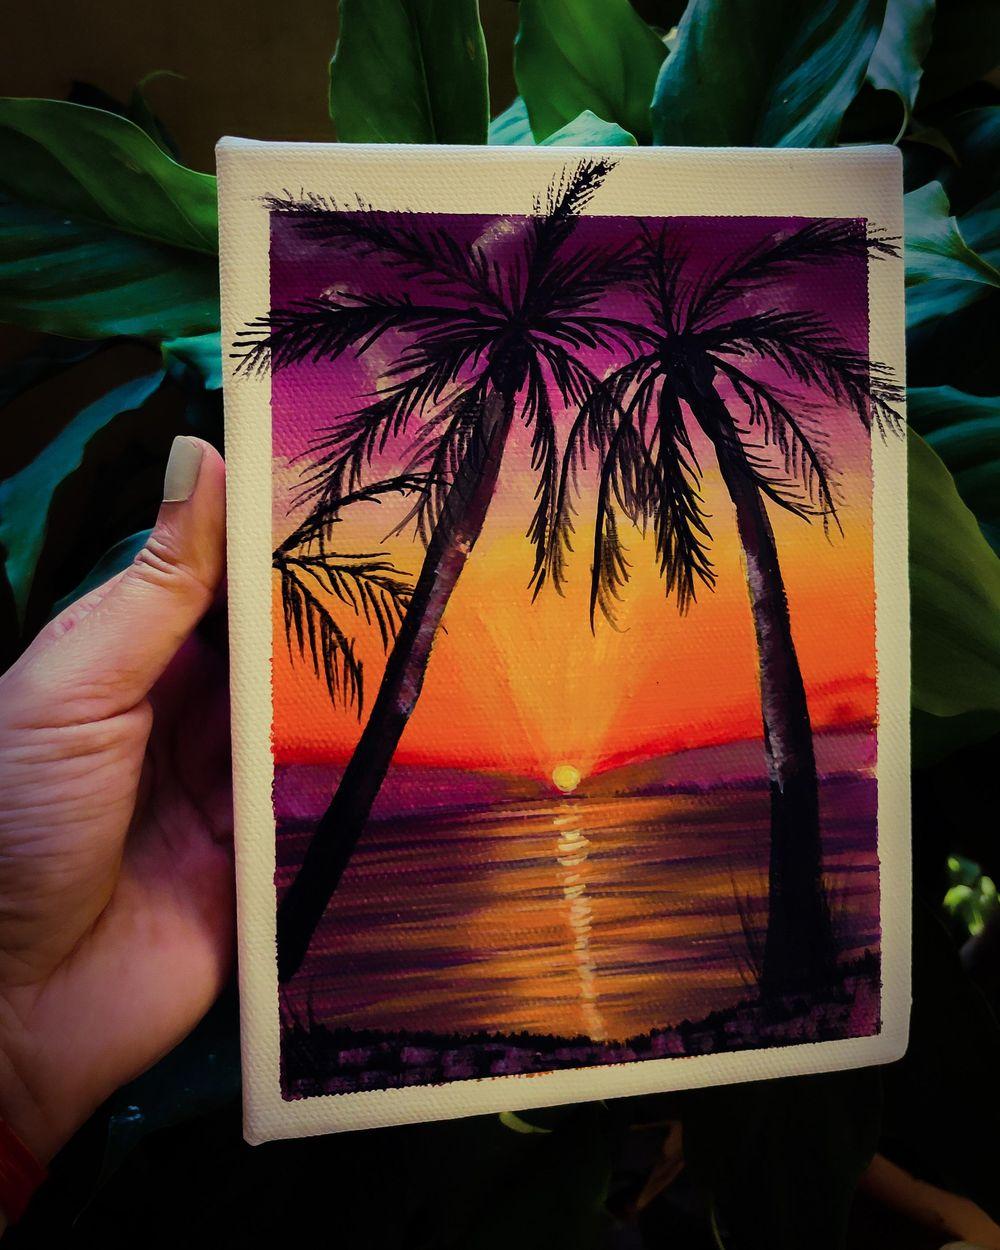 Basic Landscape Painting-Acrylic Gouache - image 1 - student project